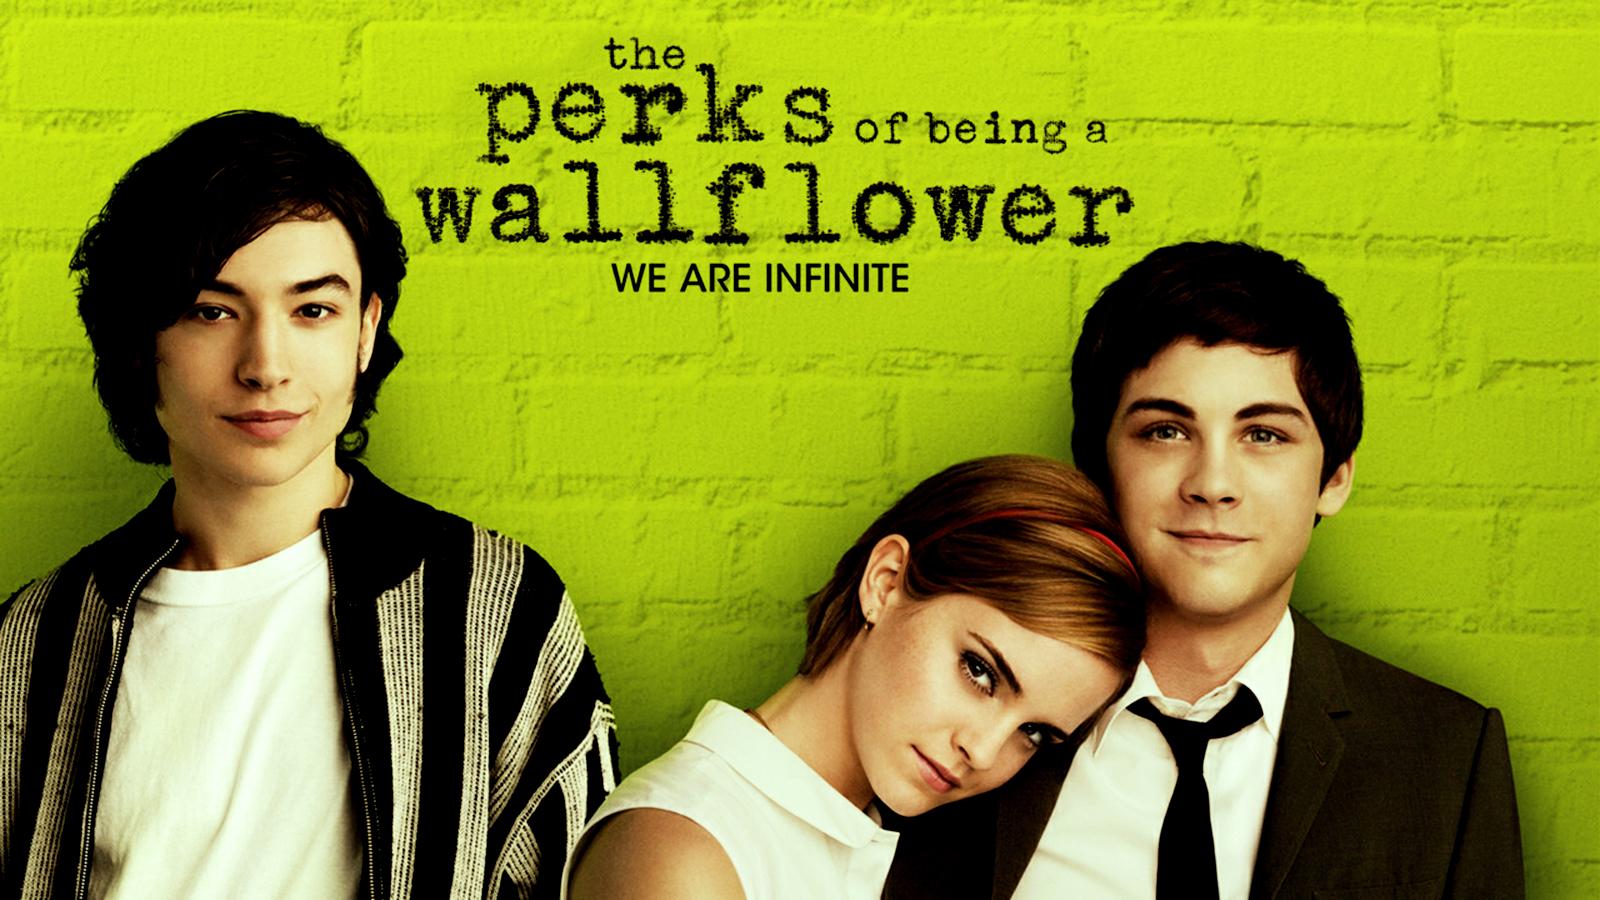 http://1.bp.blogspot.com/-3cY5KDpmFzQ/ULdSAgdm8EI/AAAAAAAADZo/FRtltKA93K4/s1600/The+Perks+Of+Being+A+Wallflower+Wallpaper-We+Are+Infinite.jpg